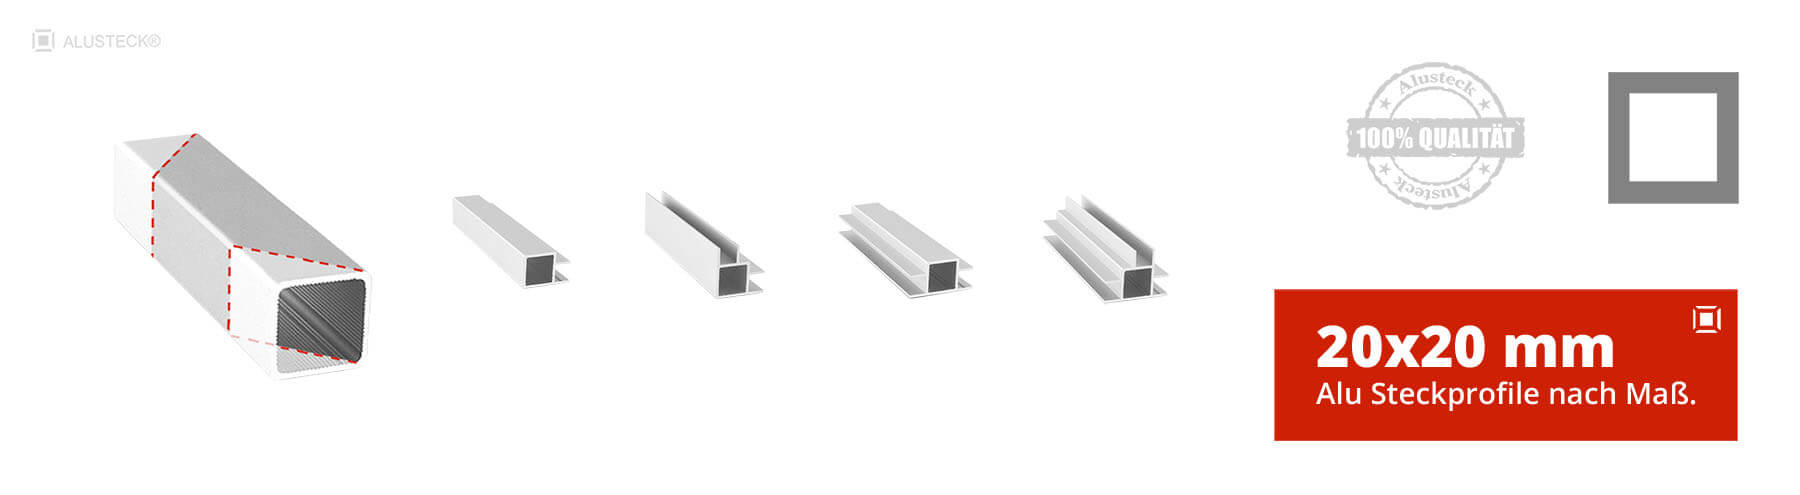 Alu Steckprofile Aluprofile Aluminiumprofile nach Maß 20x20mm Stecksystem  Onlineshop kaufen